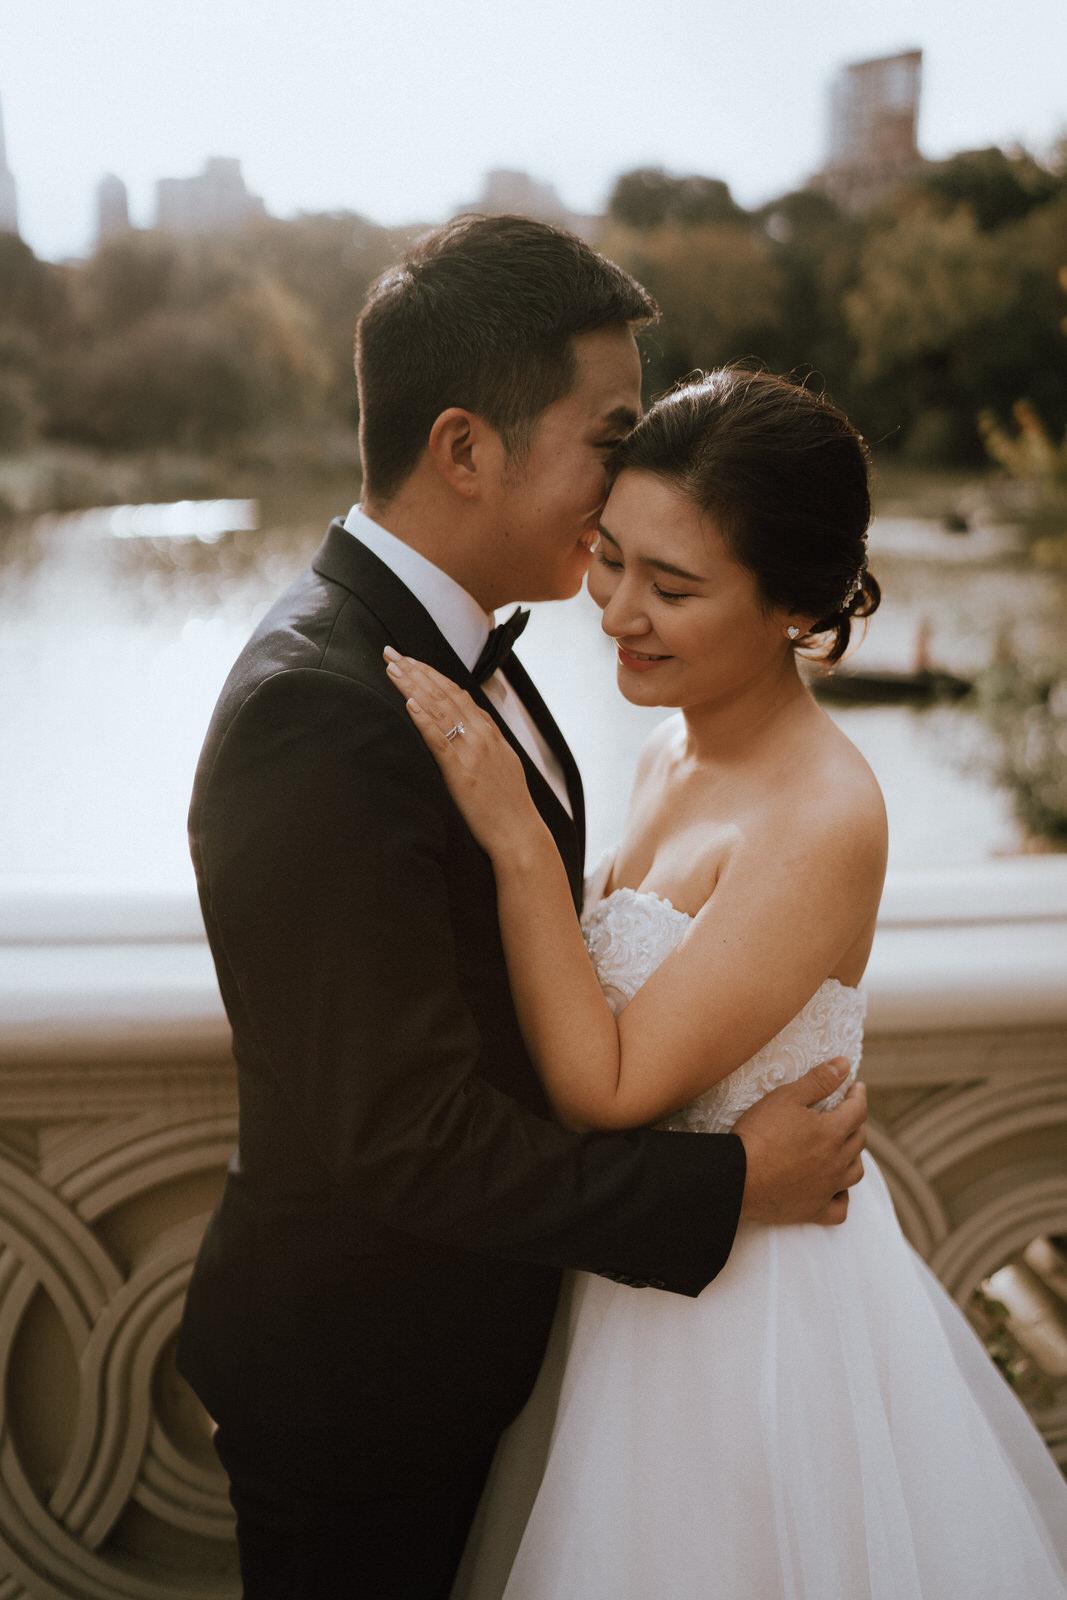 Central Park Elopement Photos-Bow Bridge-Michelle Gonzalez Photography- New York Wedding Photographer-44.jpg